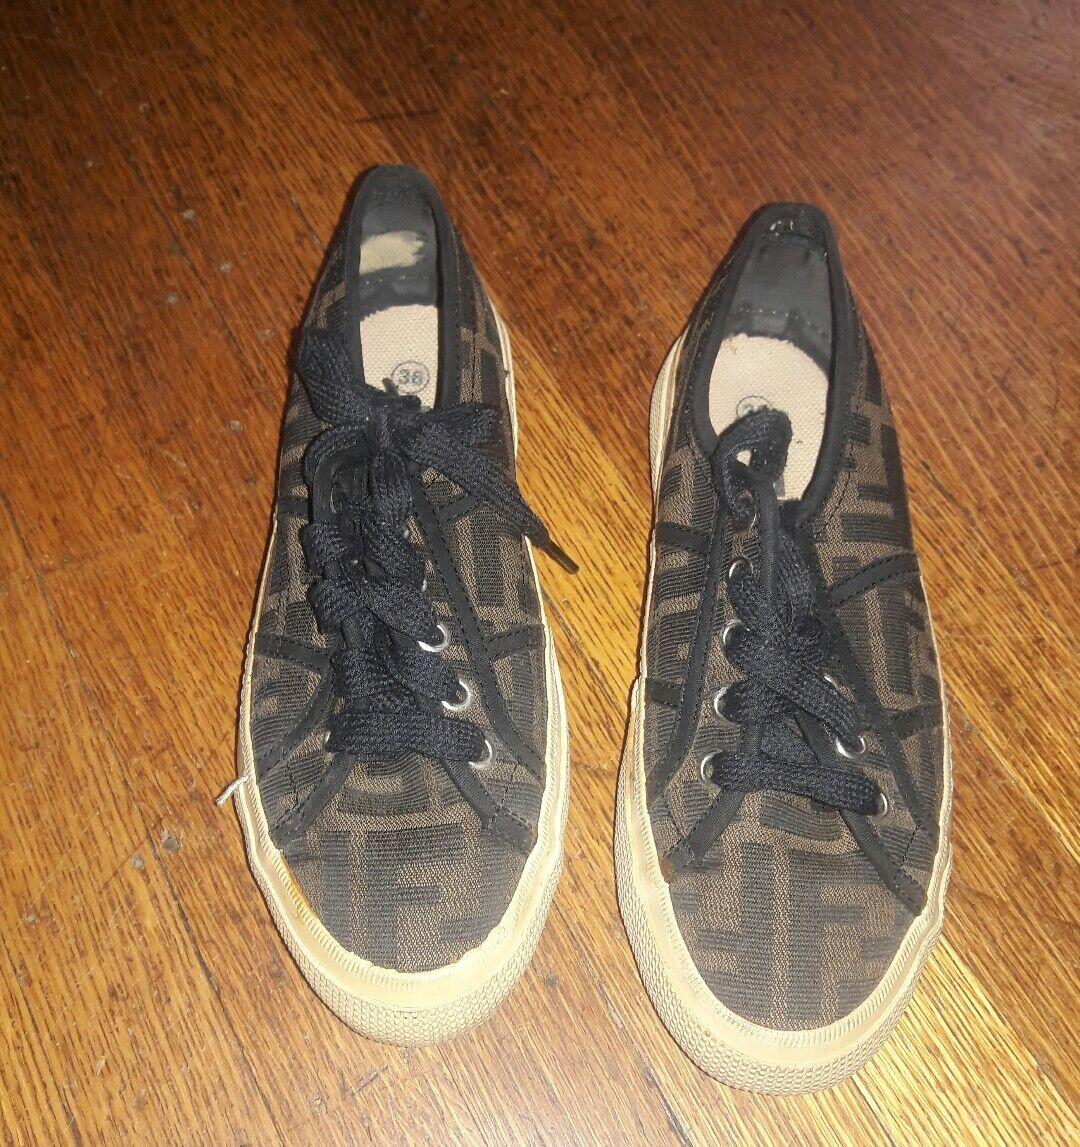 Fendi Zucca Jaquard Vintage Sneakers- Size 6- Rare